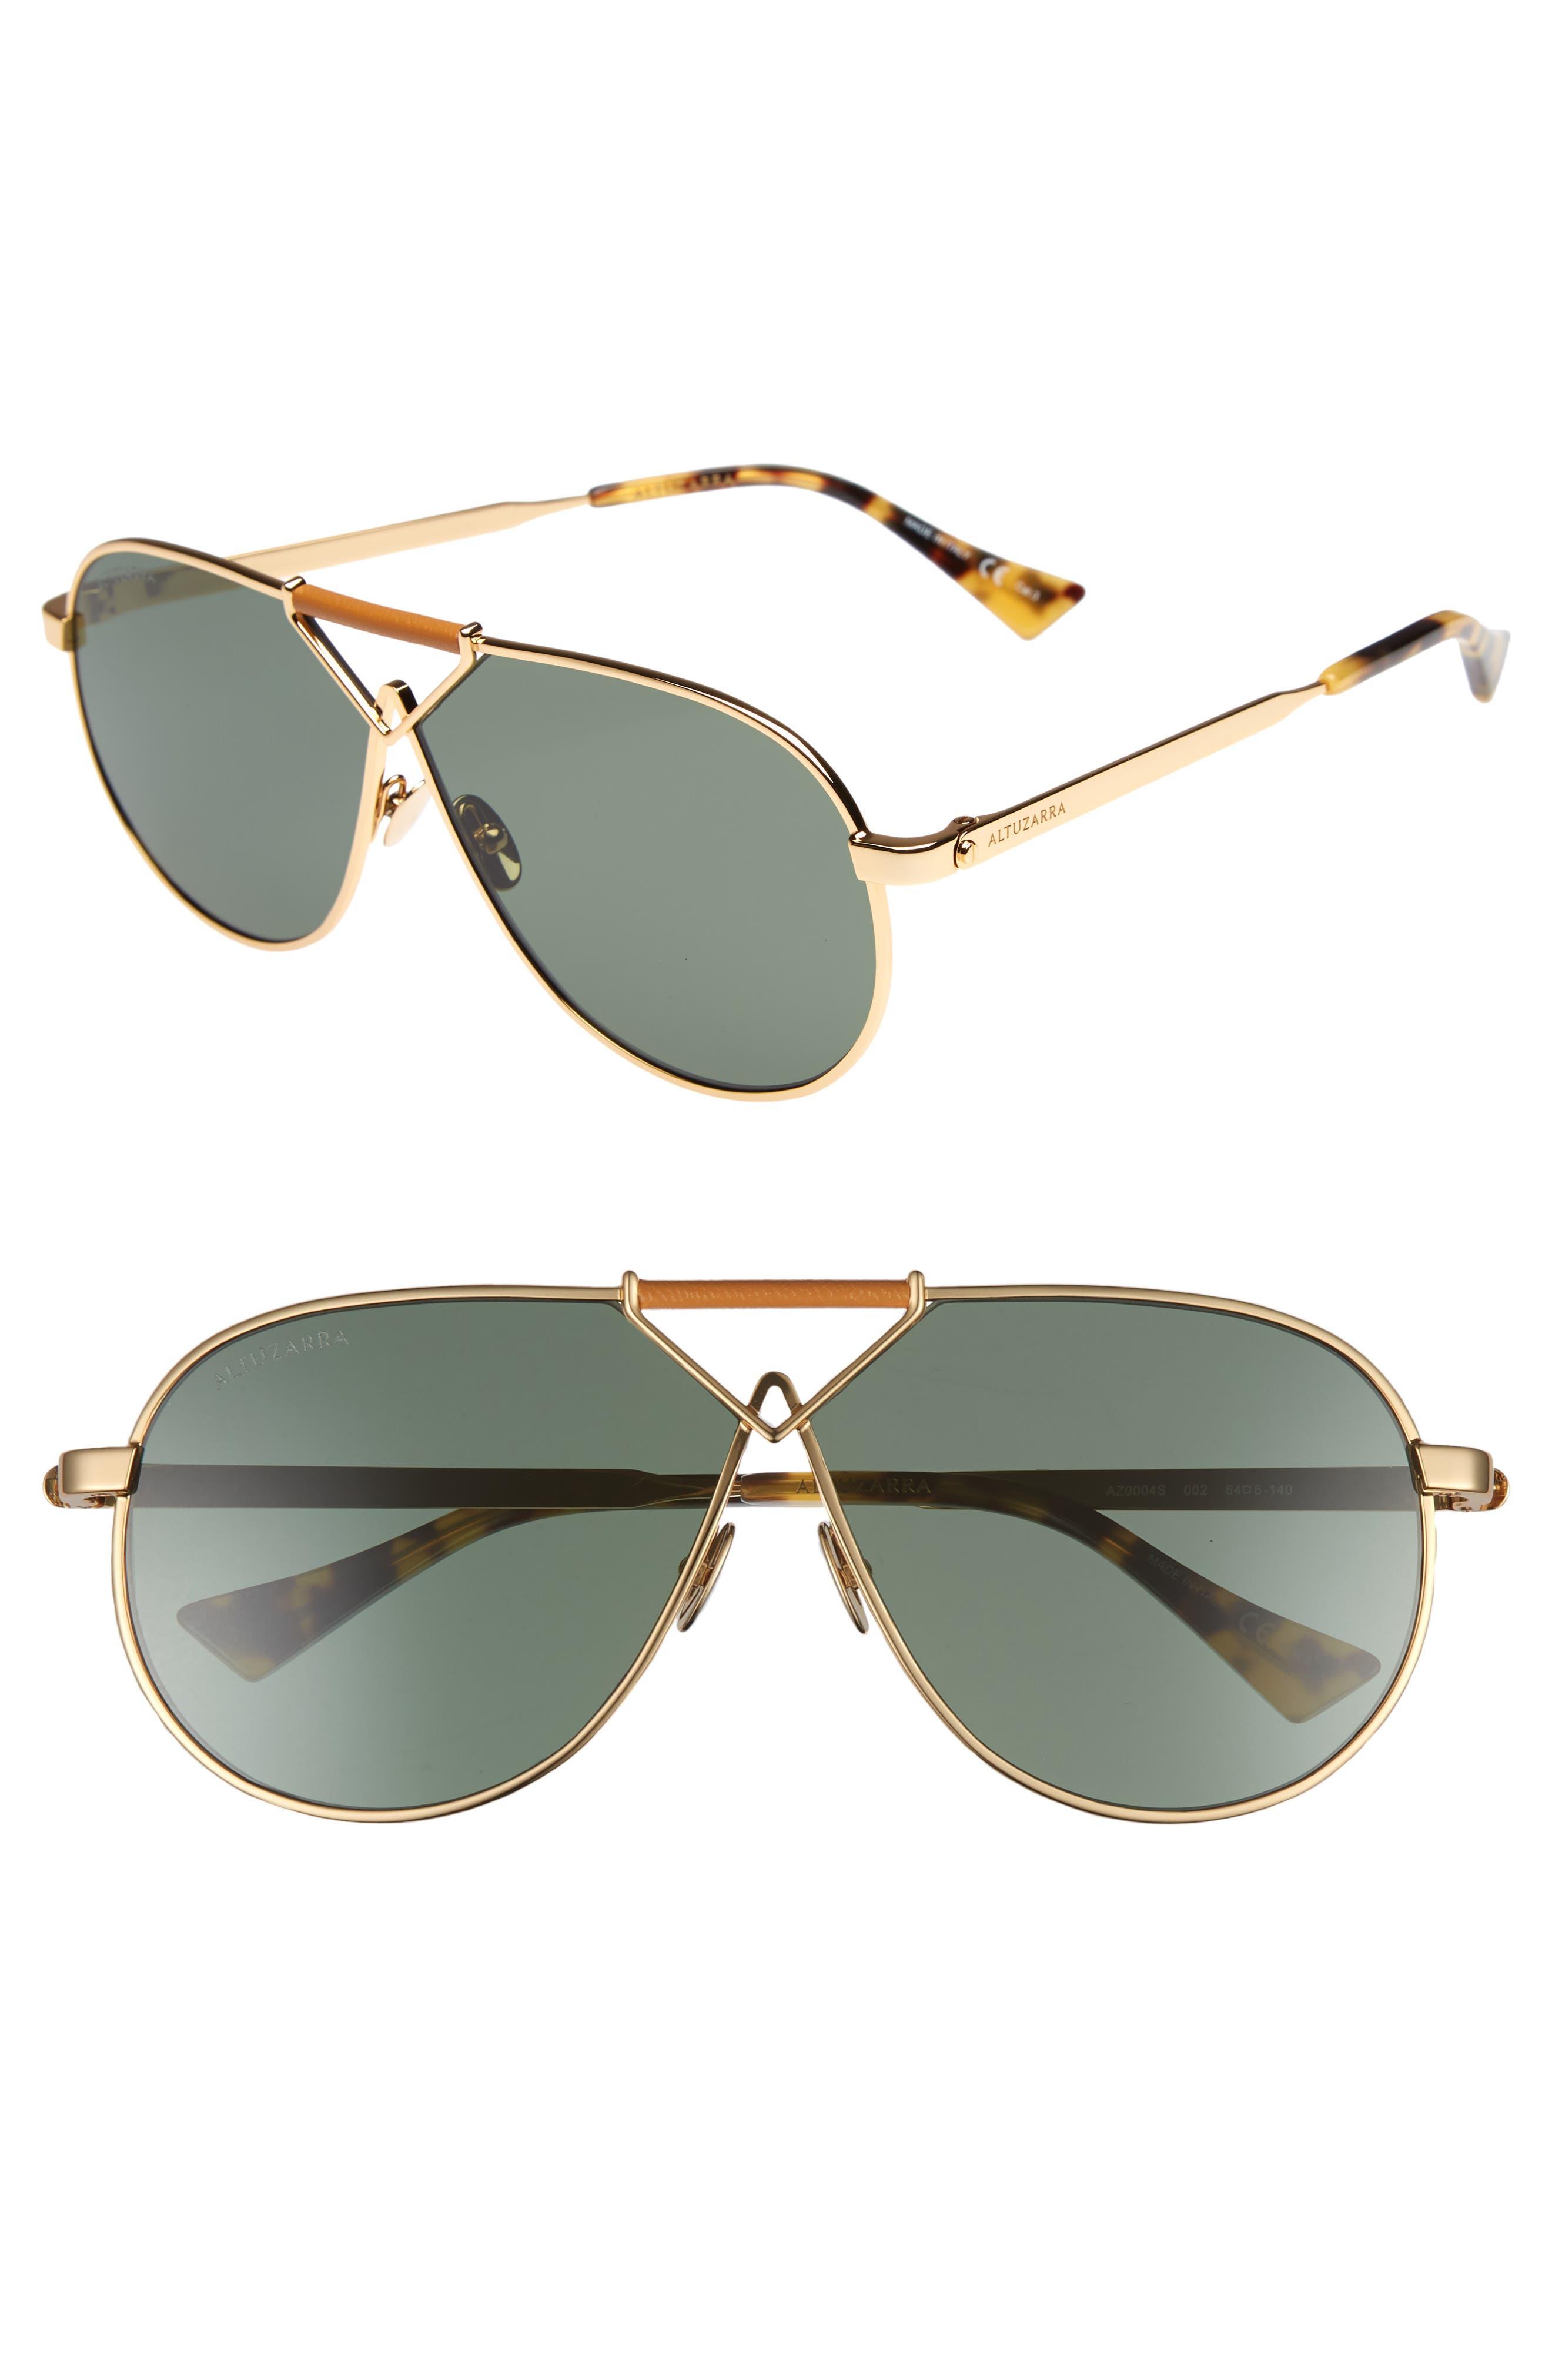 64mm Aviator Sunglasses,                         Main,                         color, Gold